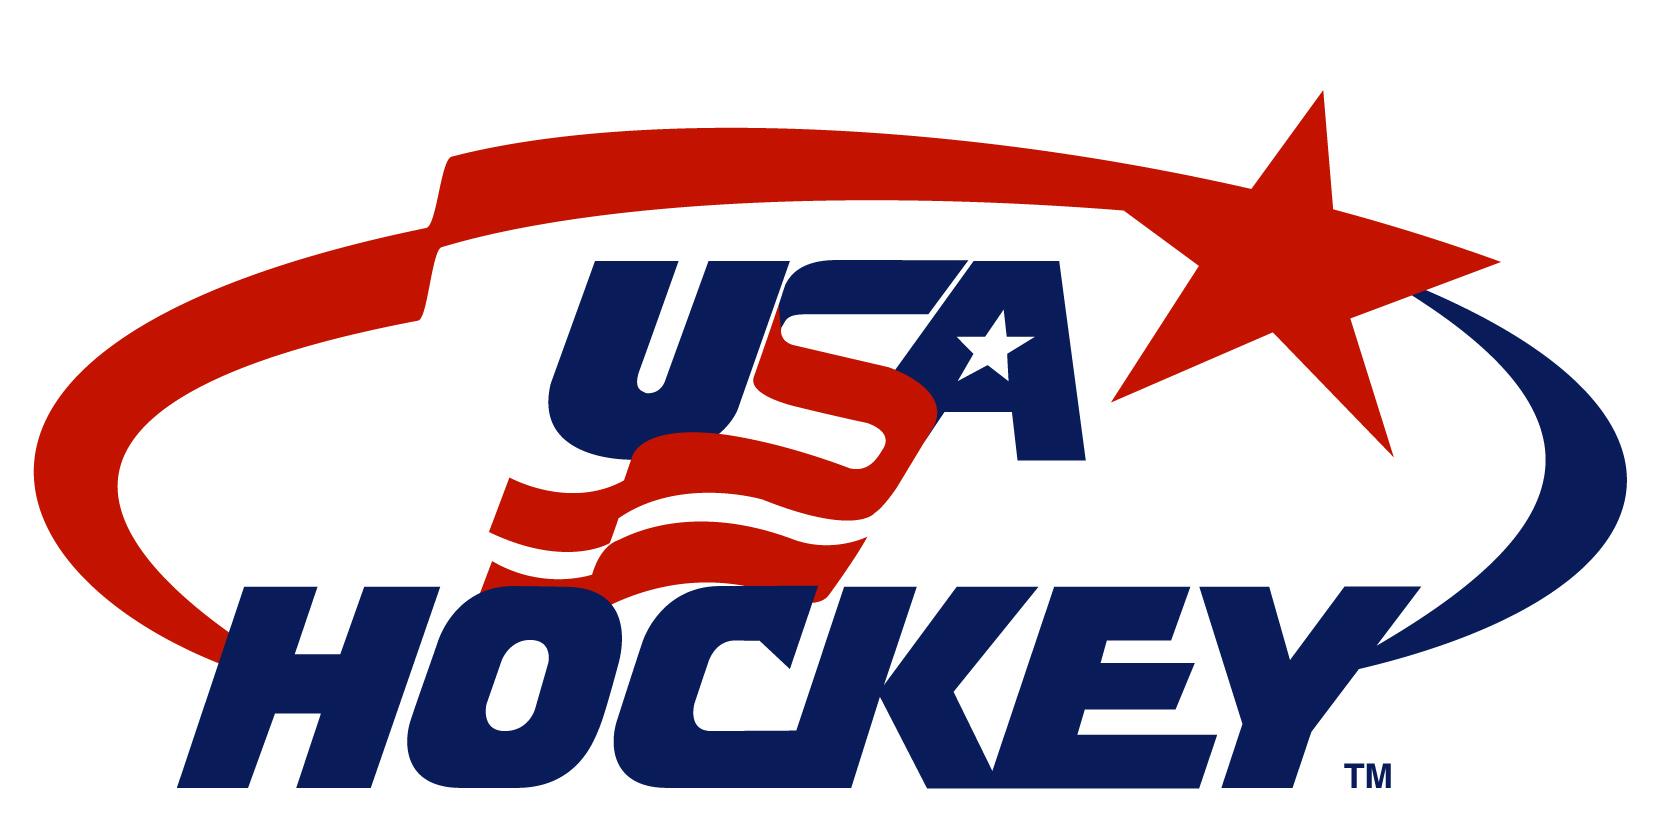 「usa hockey」の画像検索結果